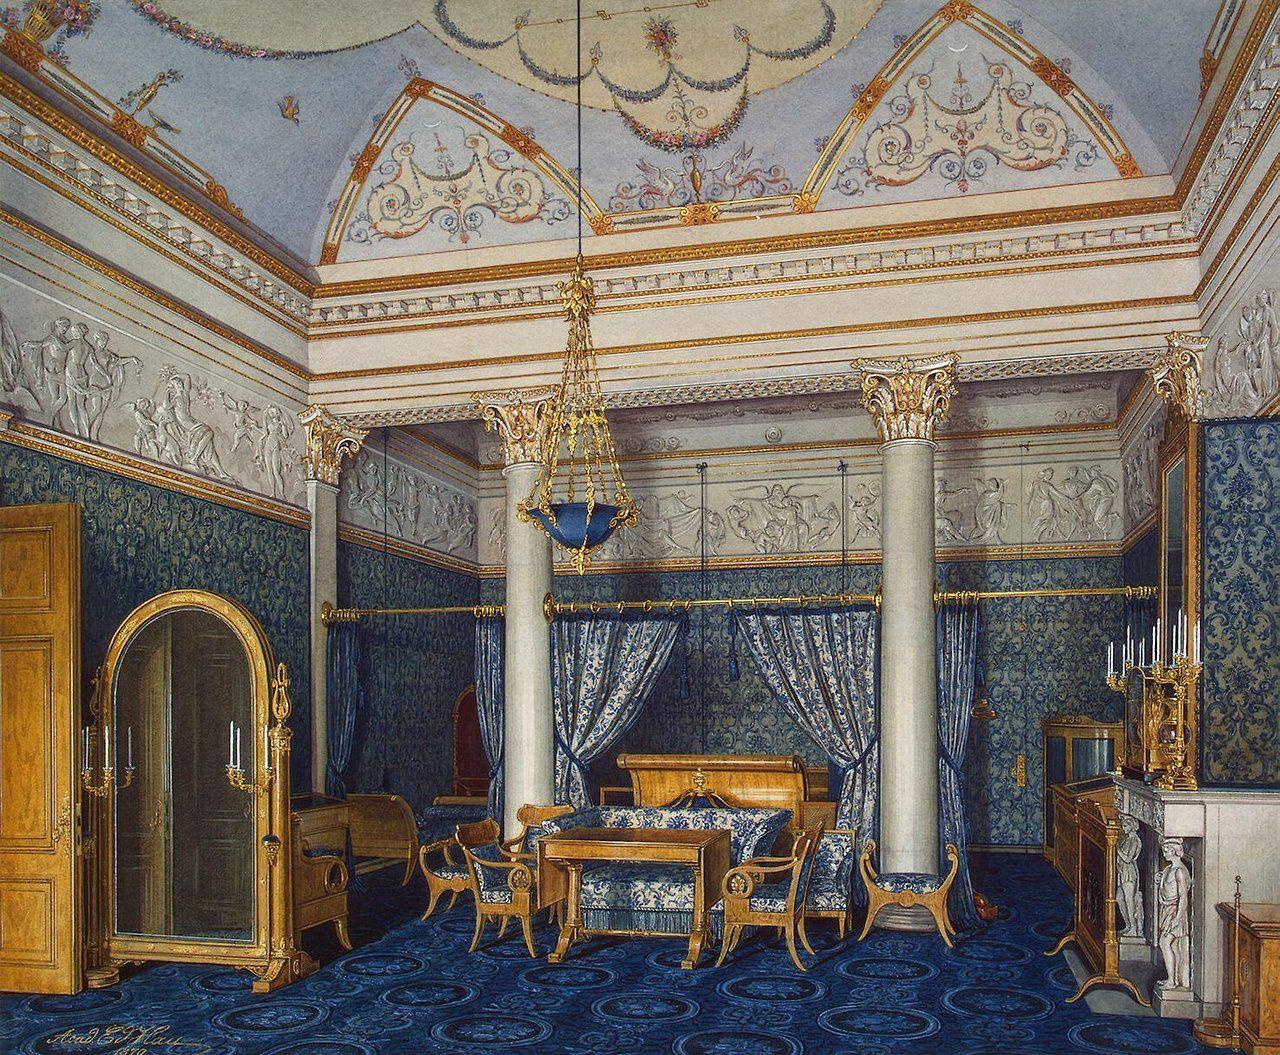 Inside the Bedchamber of Empress Alexandra Fyodorovna at the Winter Palace, Saint Petersburg